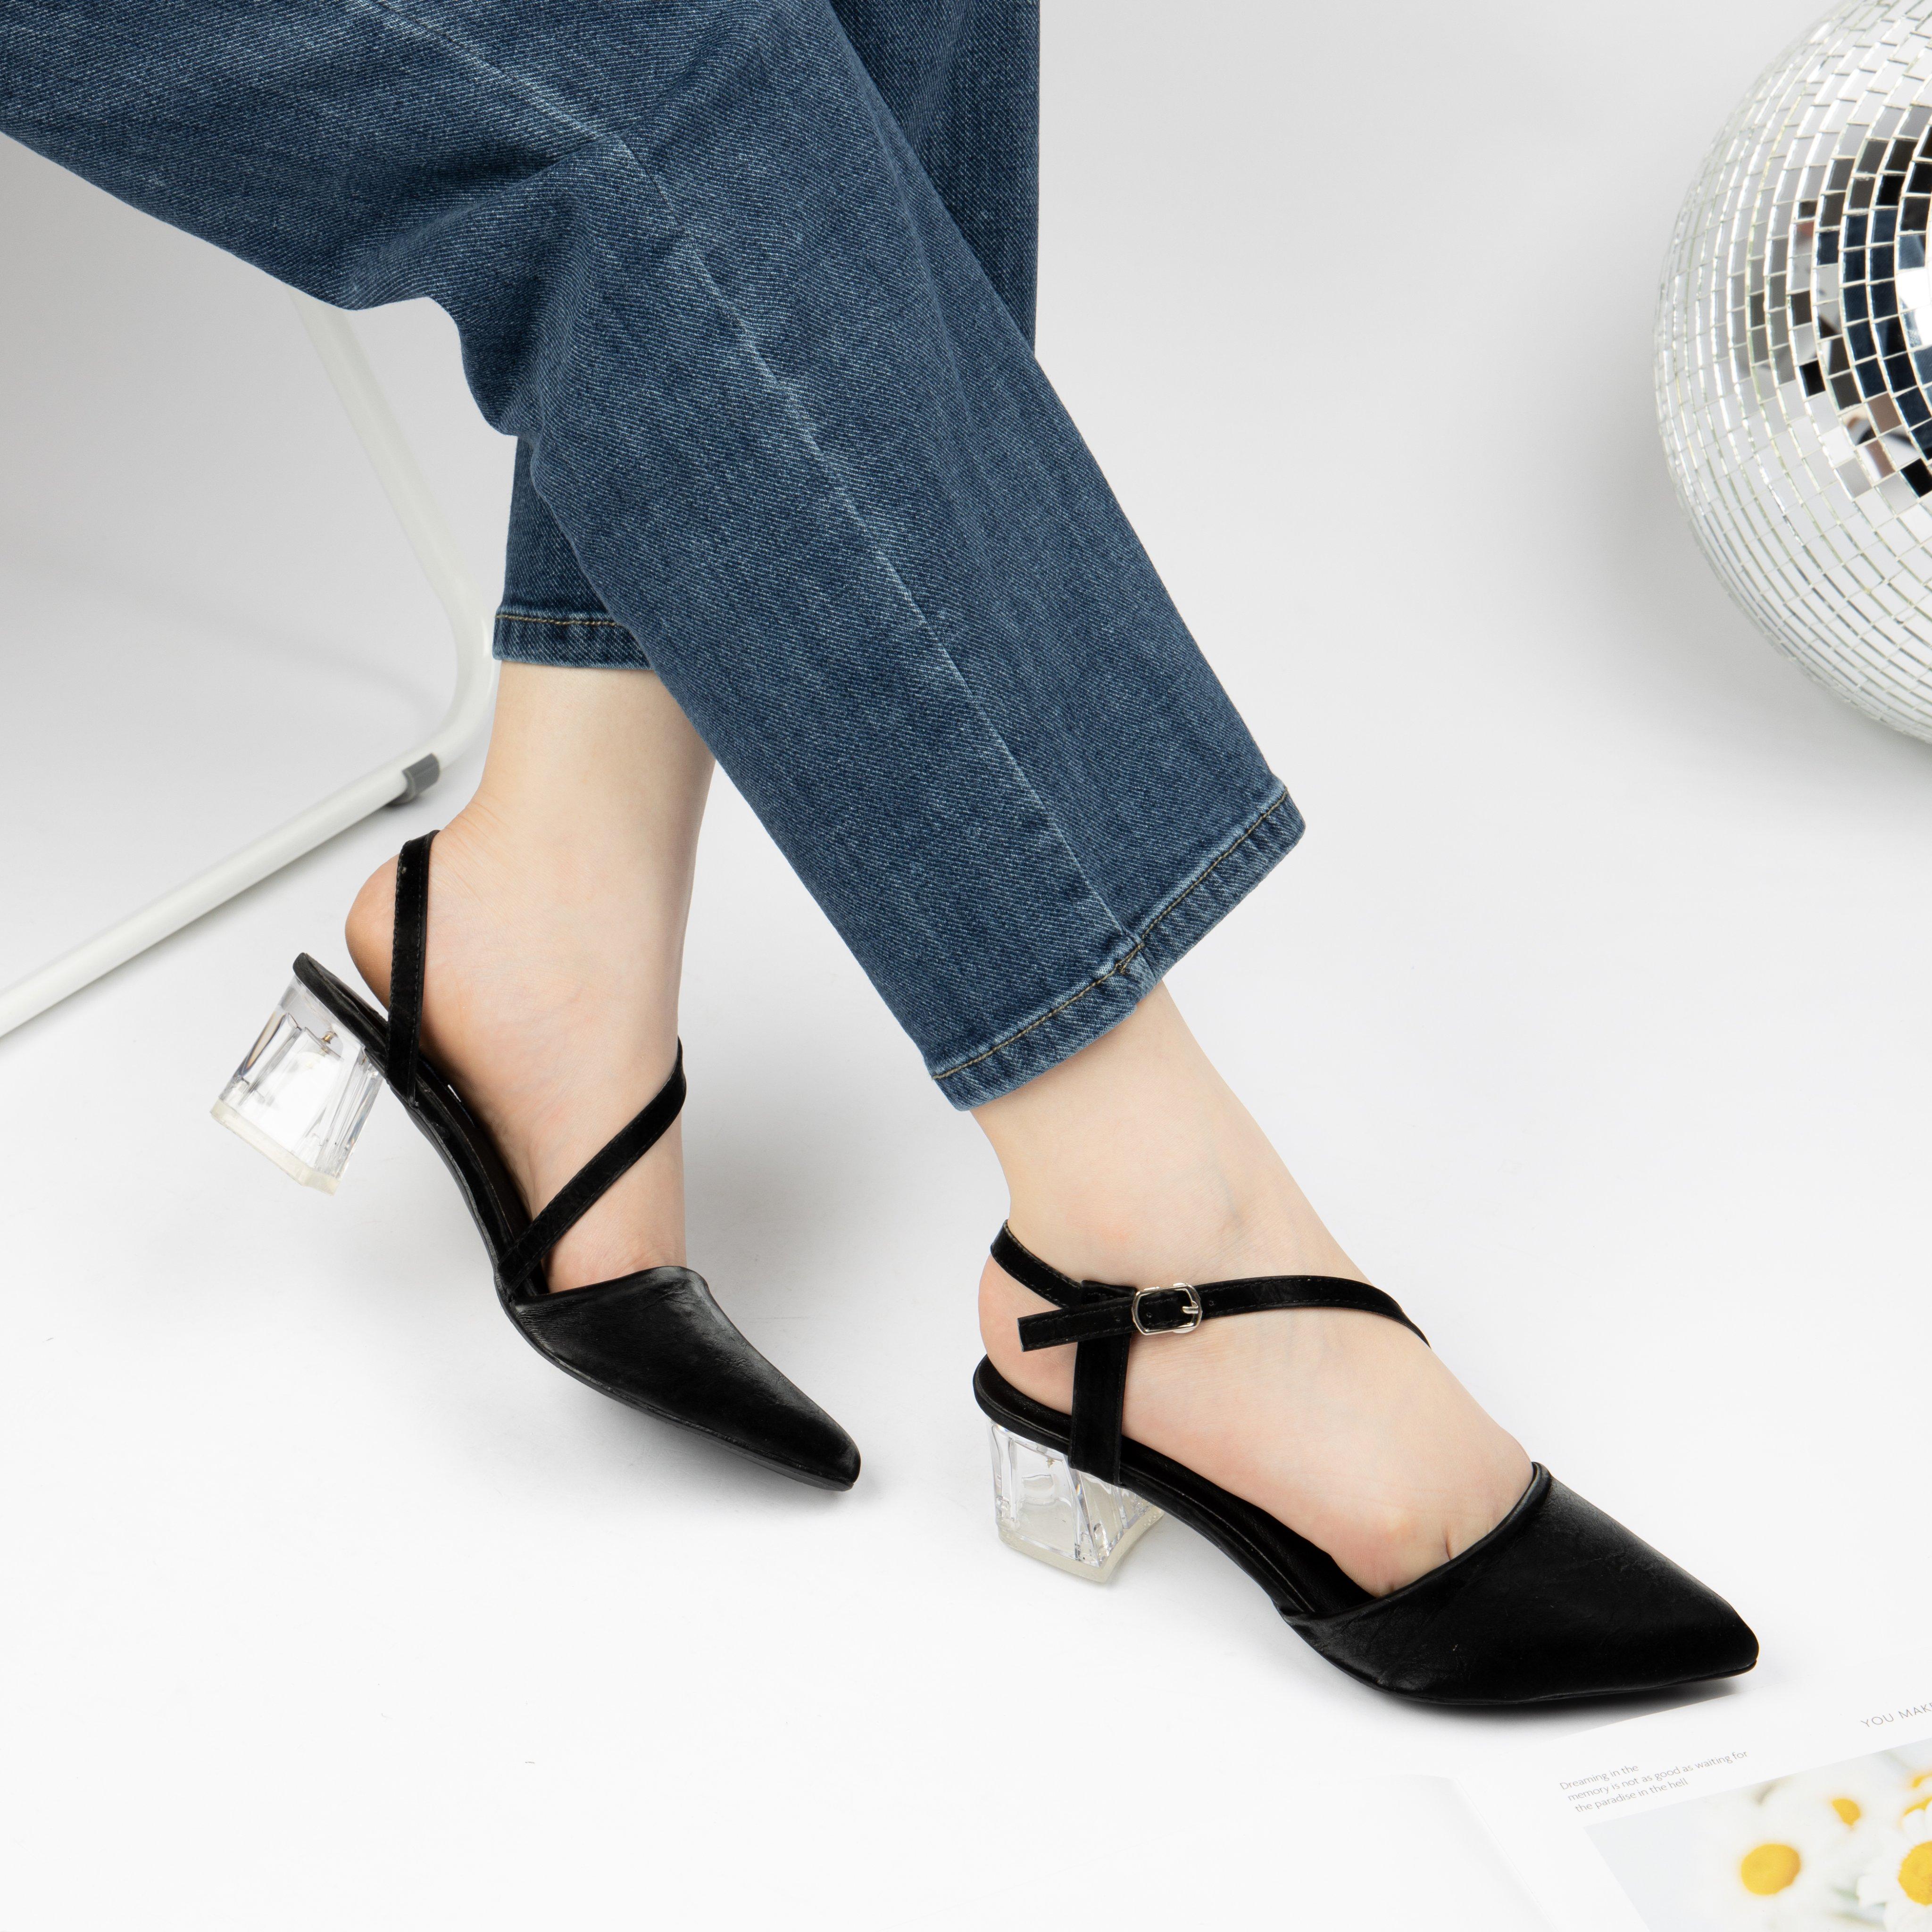 Giày cao gót MWC NUCG-4164